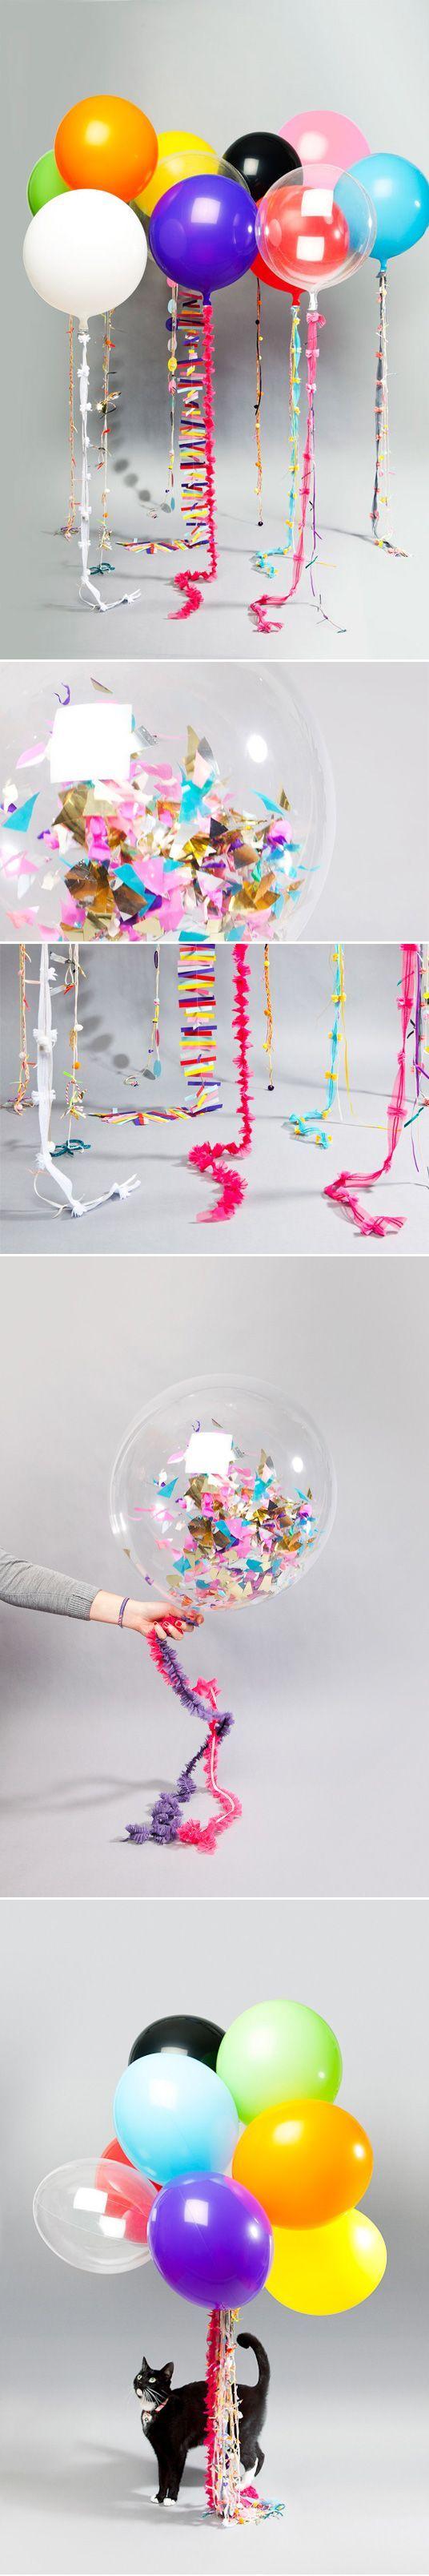 DIY Ballonnen ideeën voor de Feestdagen o.a. Oud & Nieuw. Met Confetti en Tasselslingers www.pretapret.nl